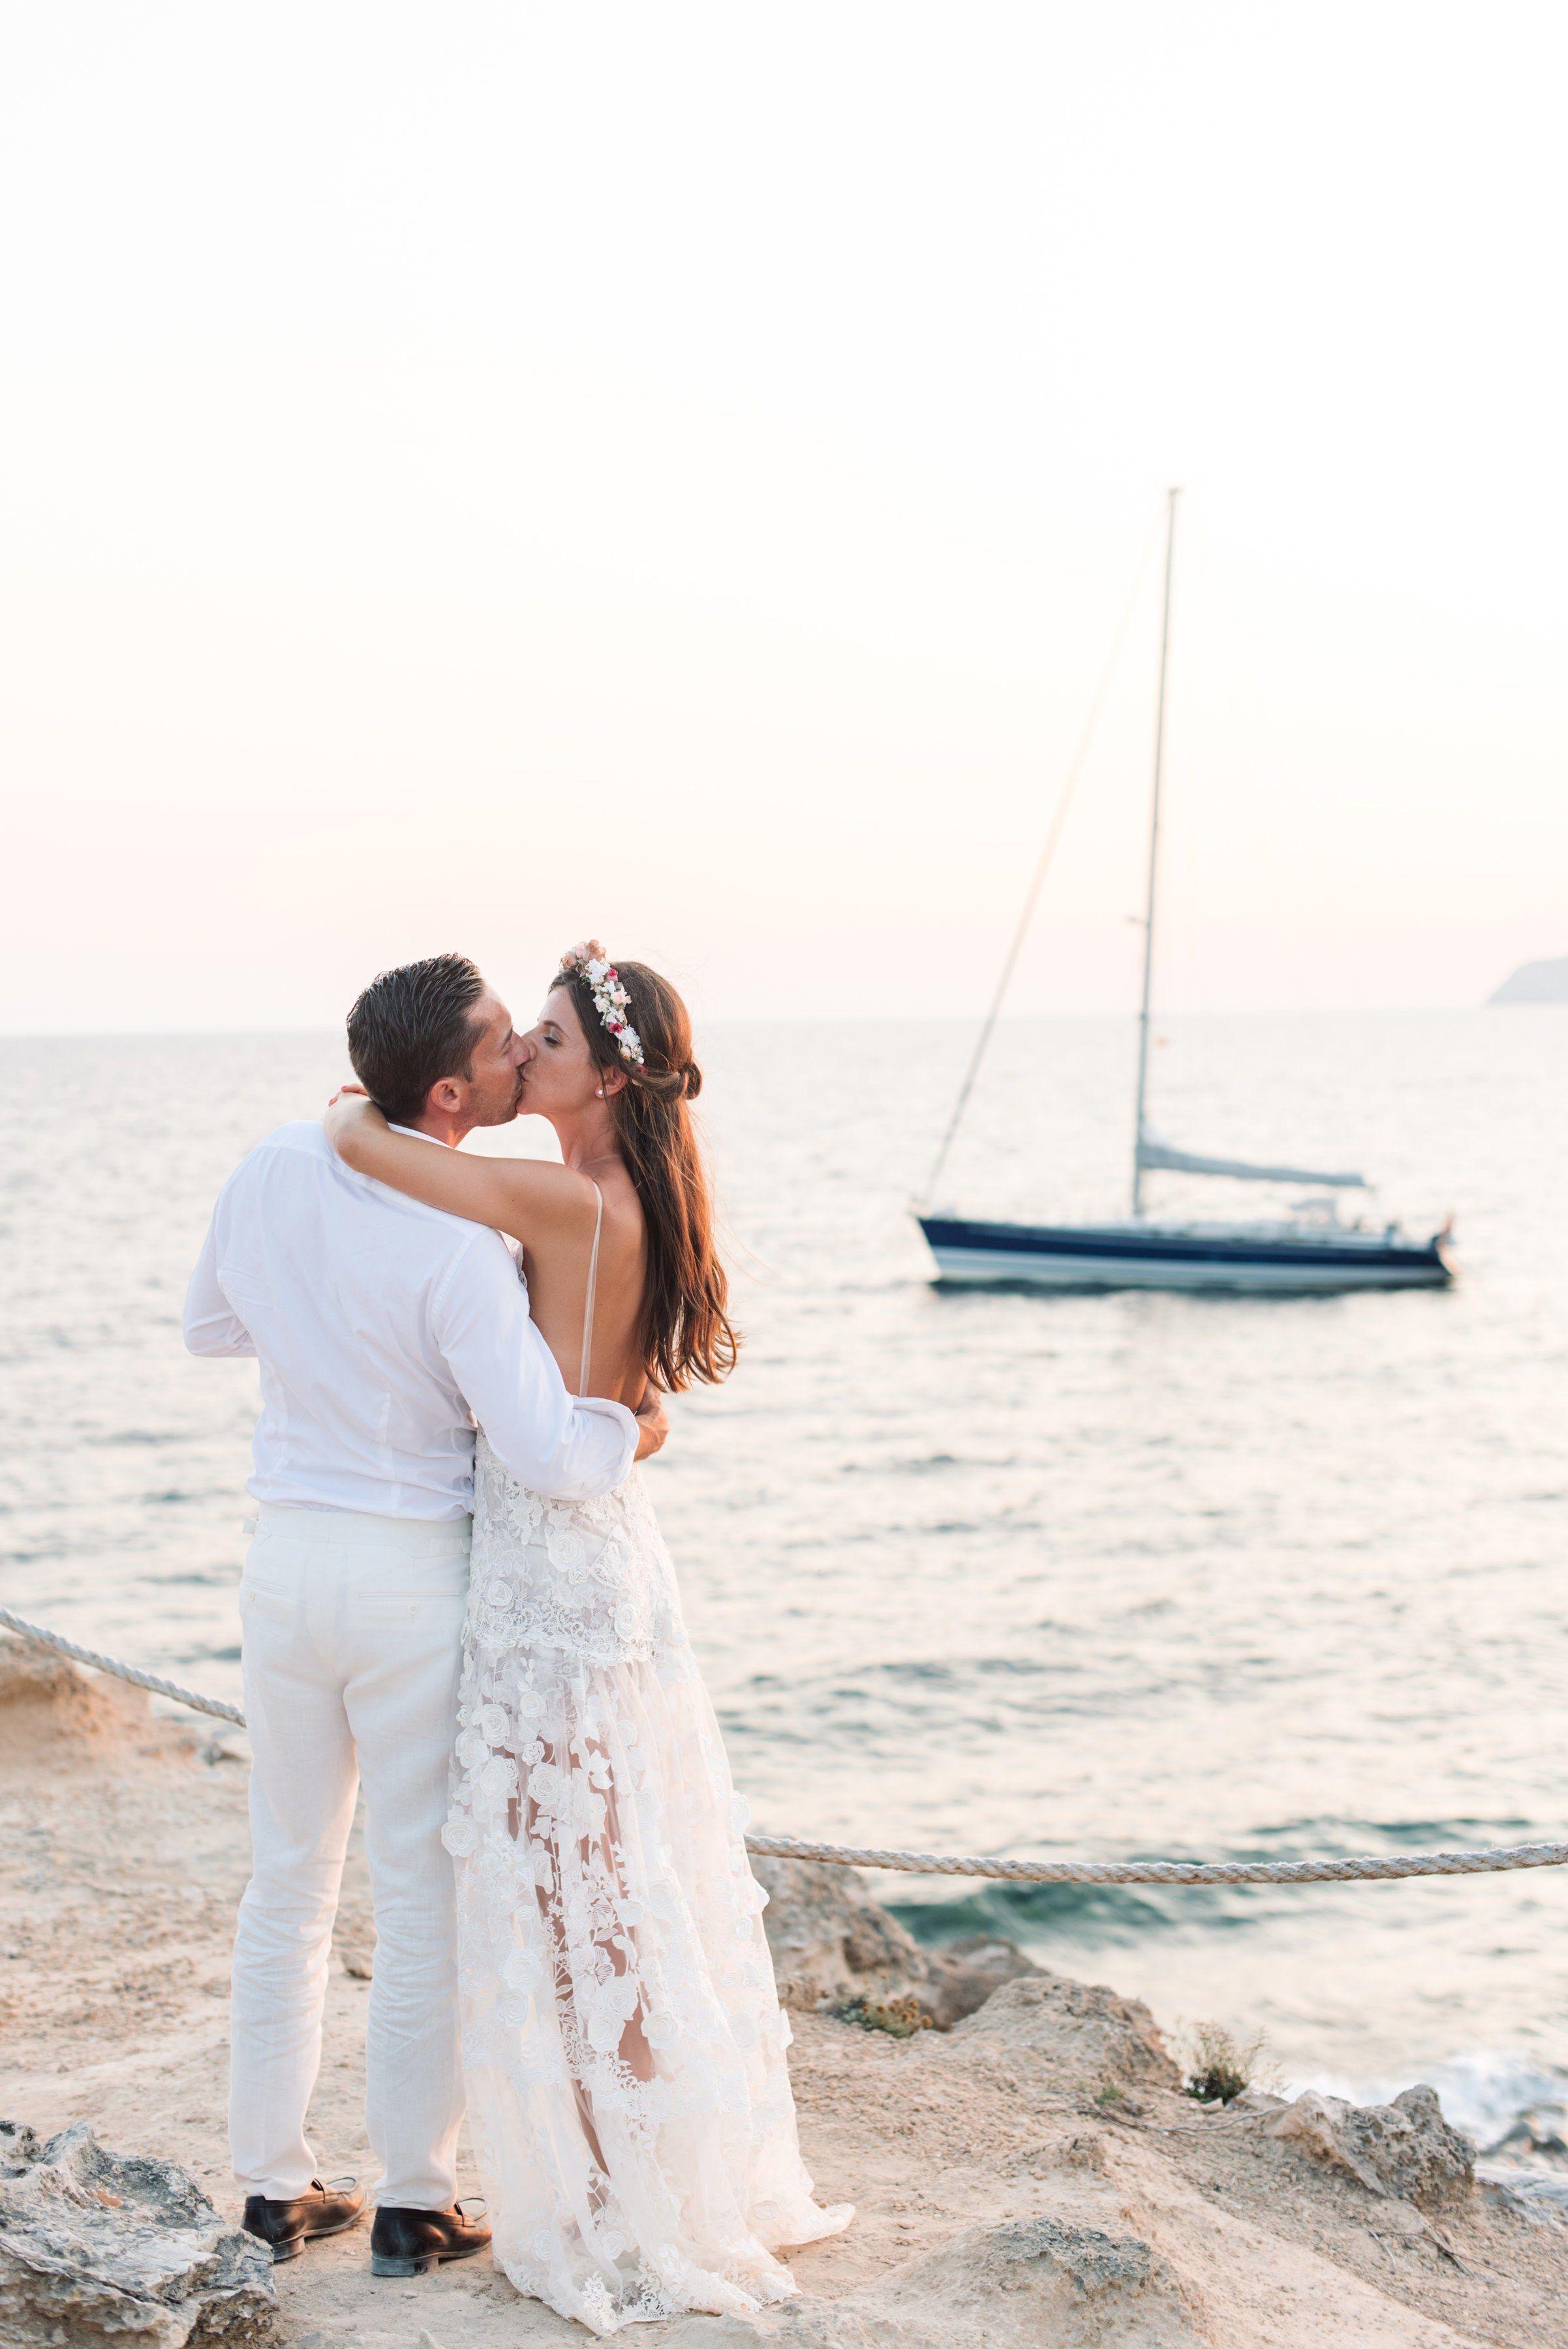 Beach wedding looks for bride  A LaidBack Beach Wedding in Ibiza  Ibiza Bride groom photos and